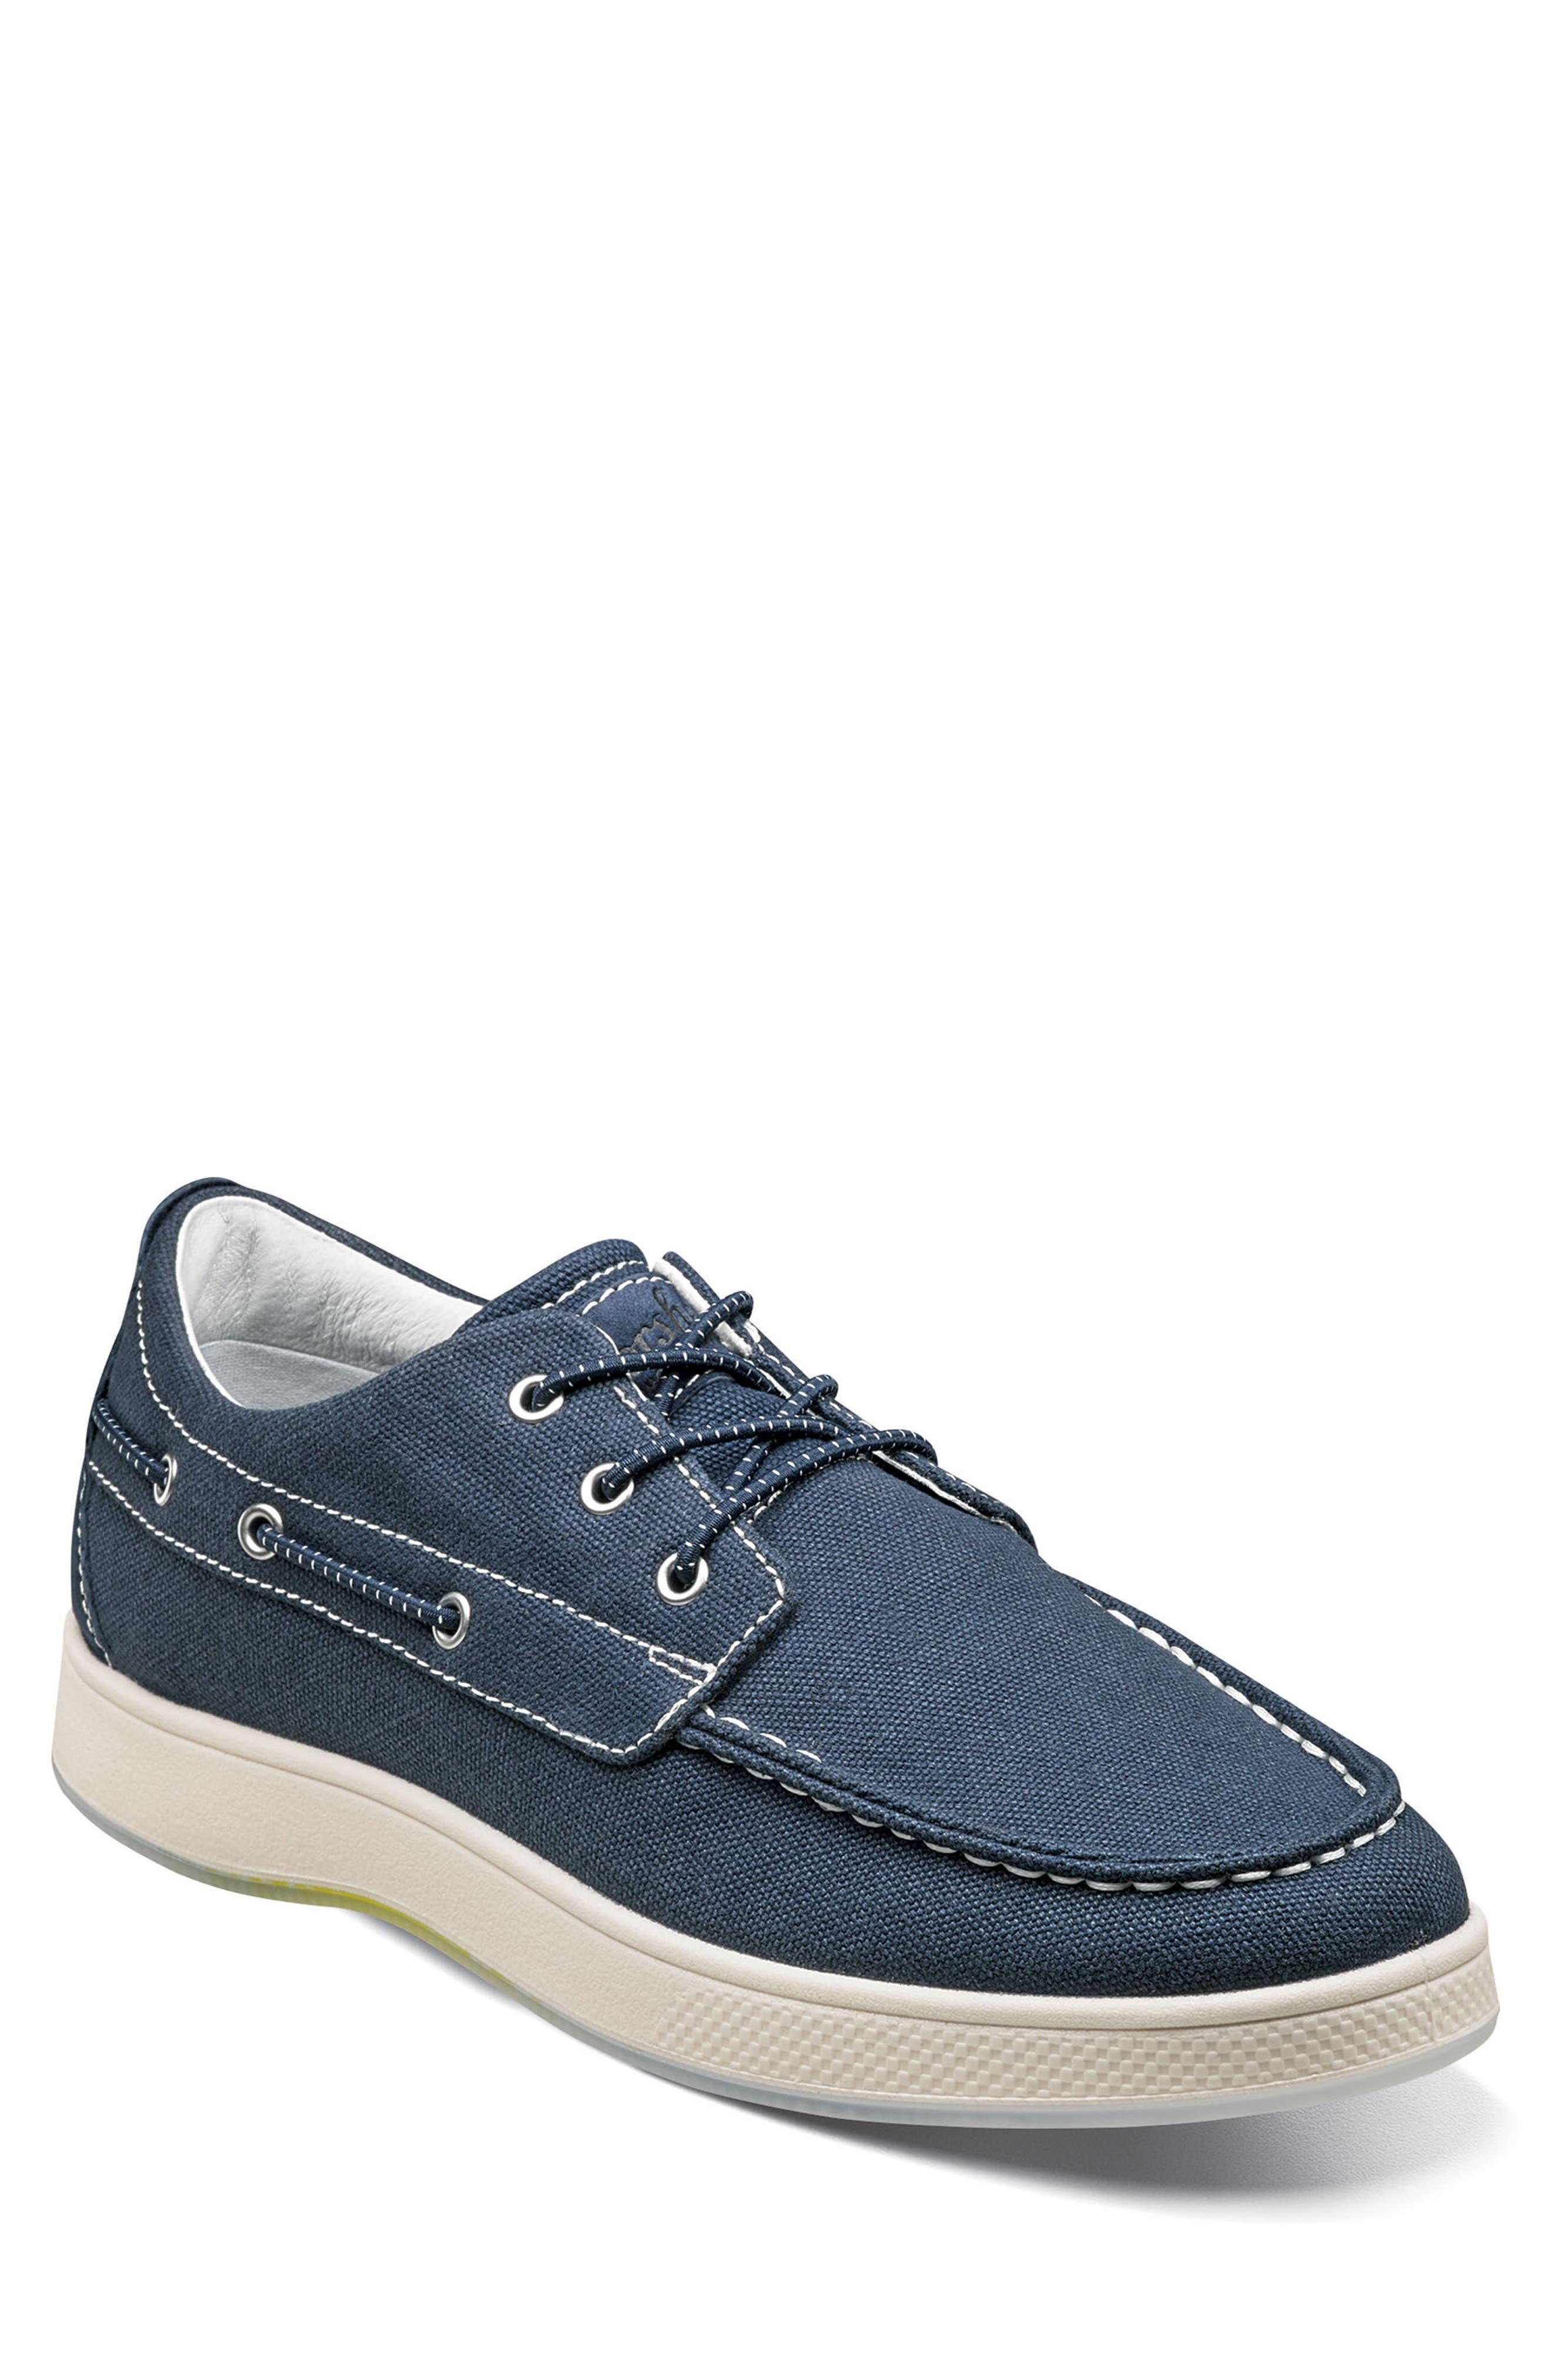 Edge Boat Shoe,                         Main,                         color, NAVY CANVAS